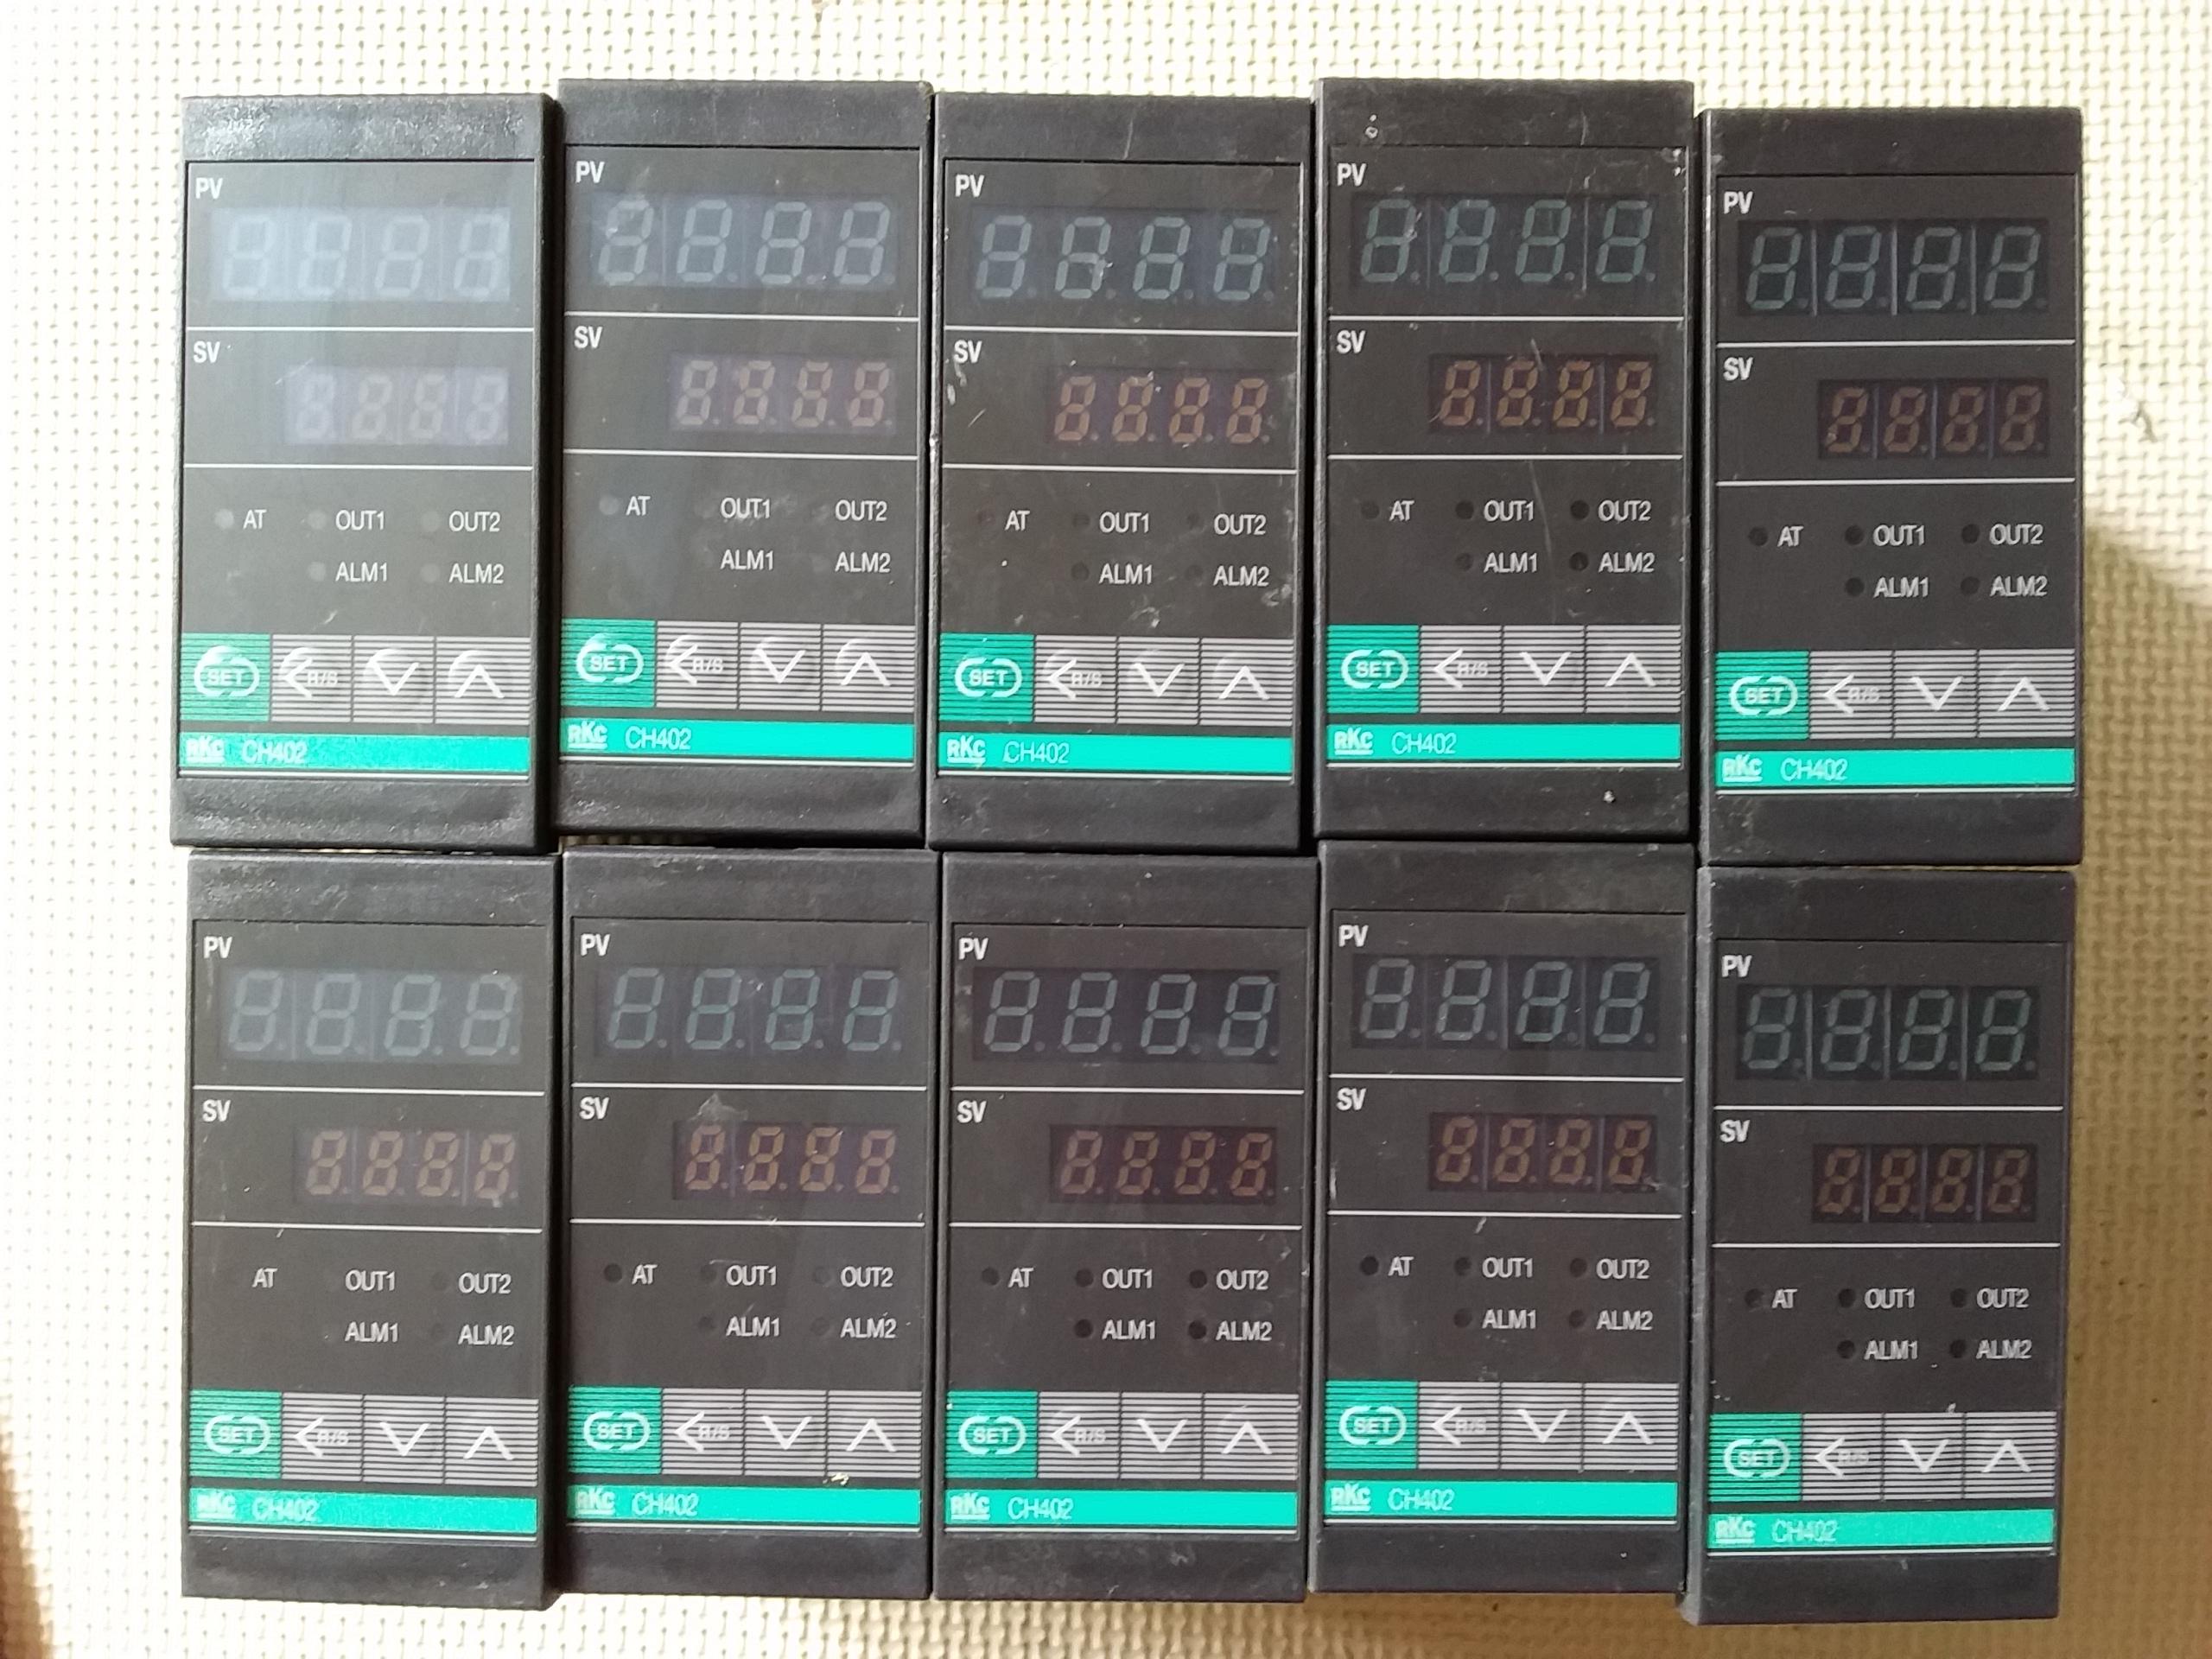 RKC CH402 de segunda mano desmontar termostato casero